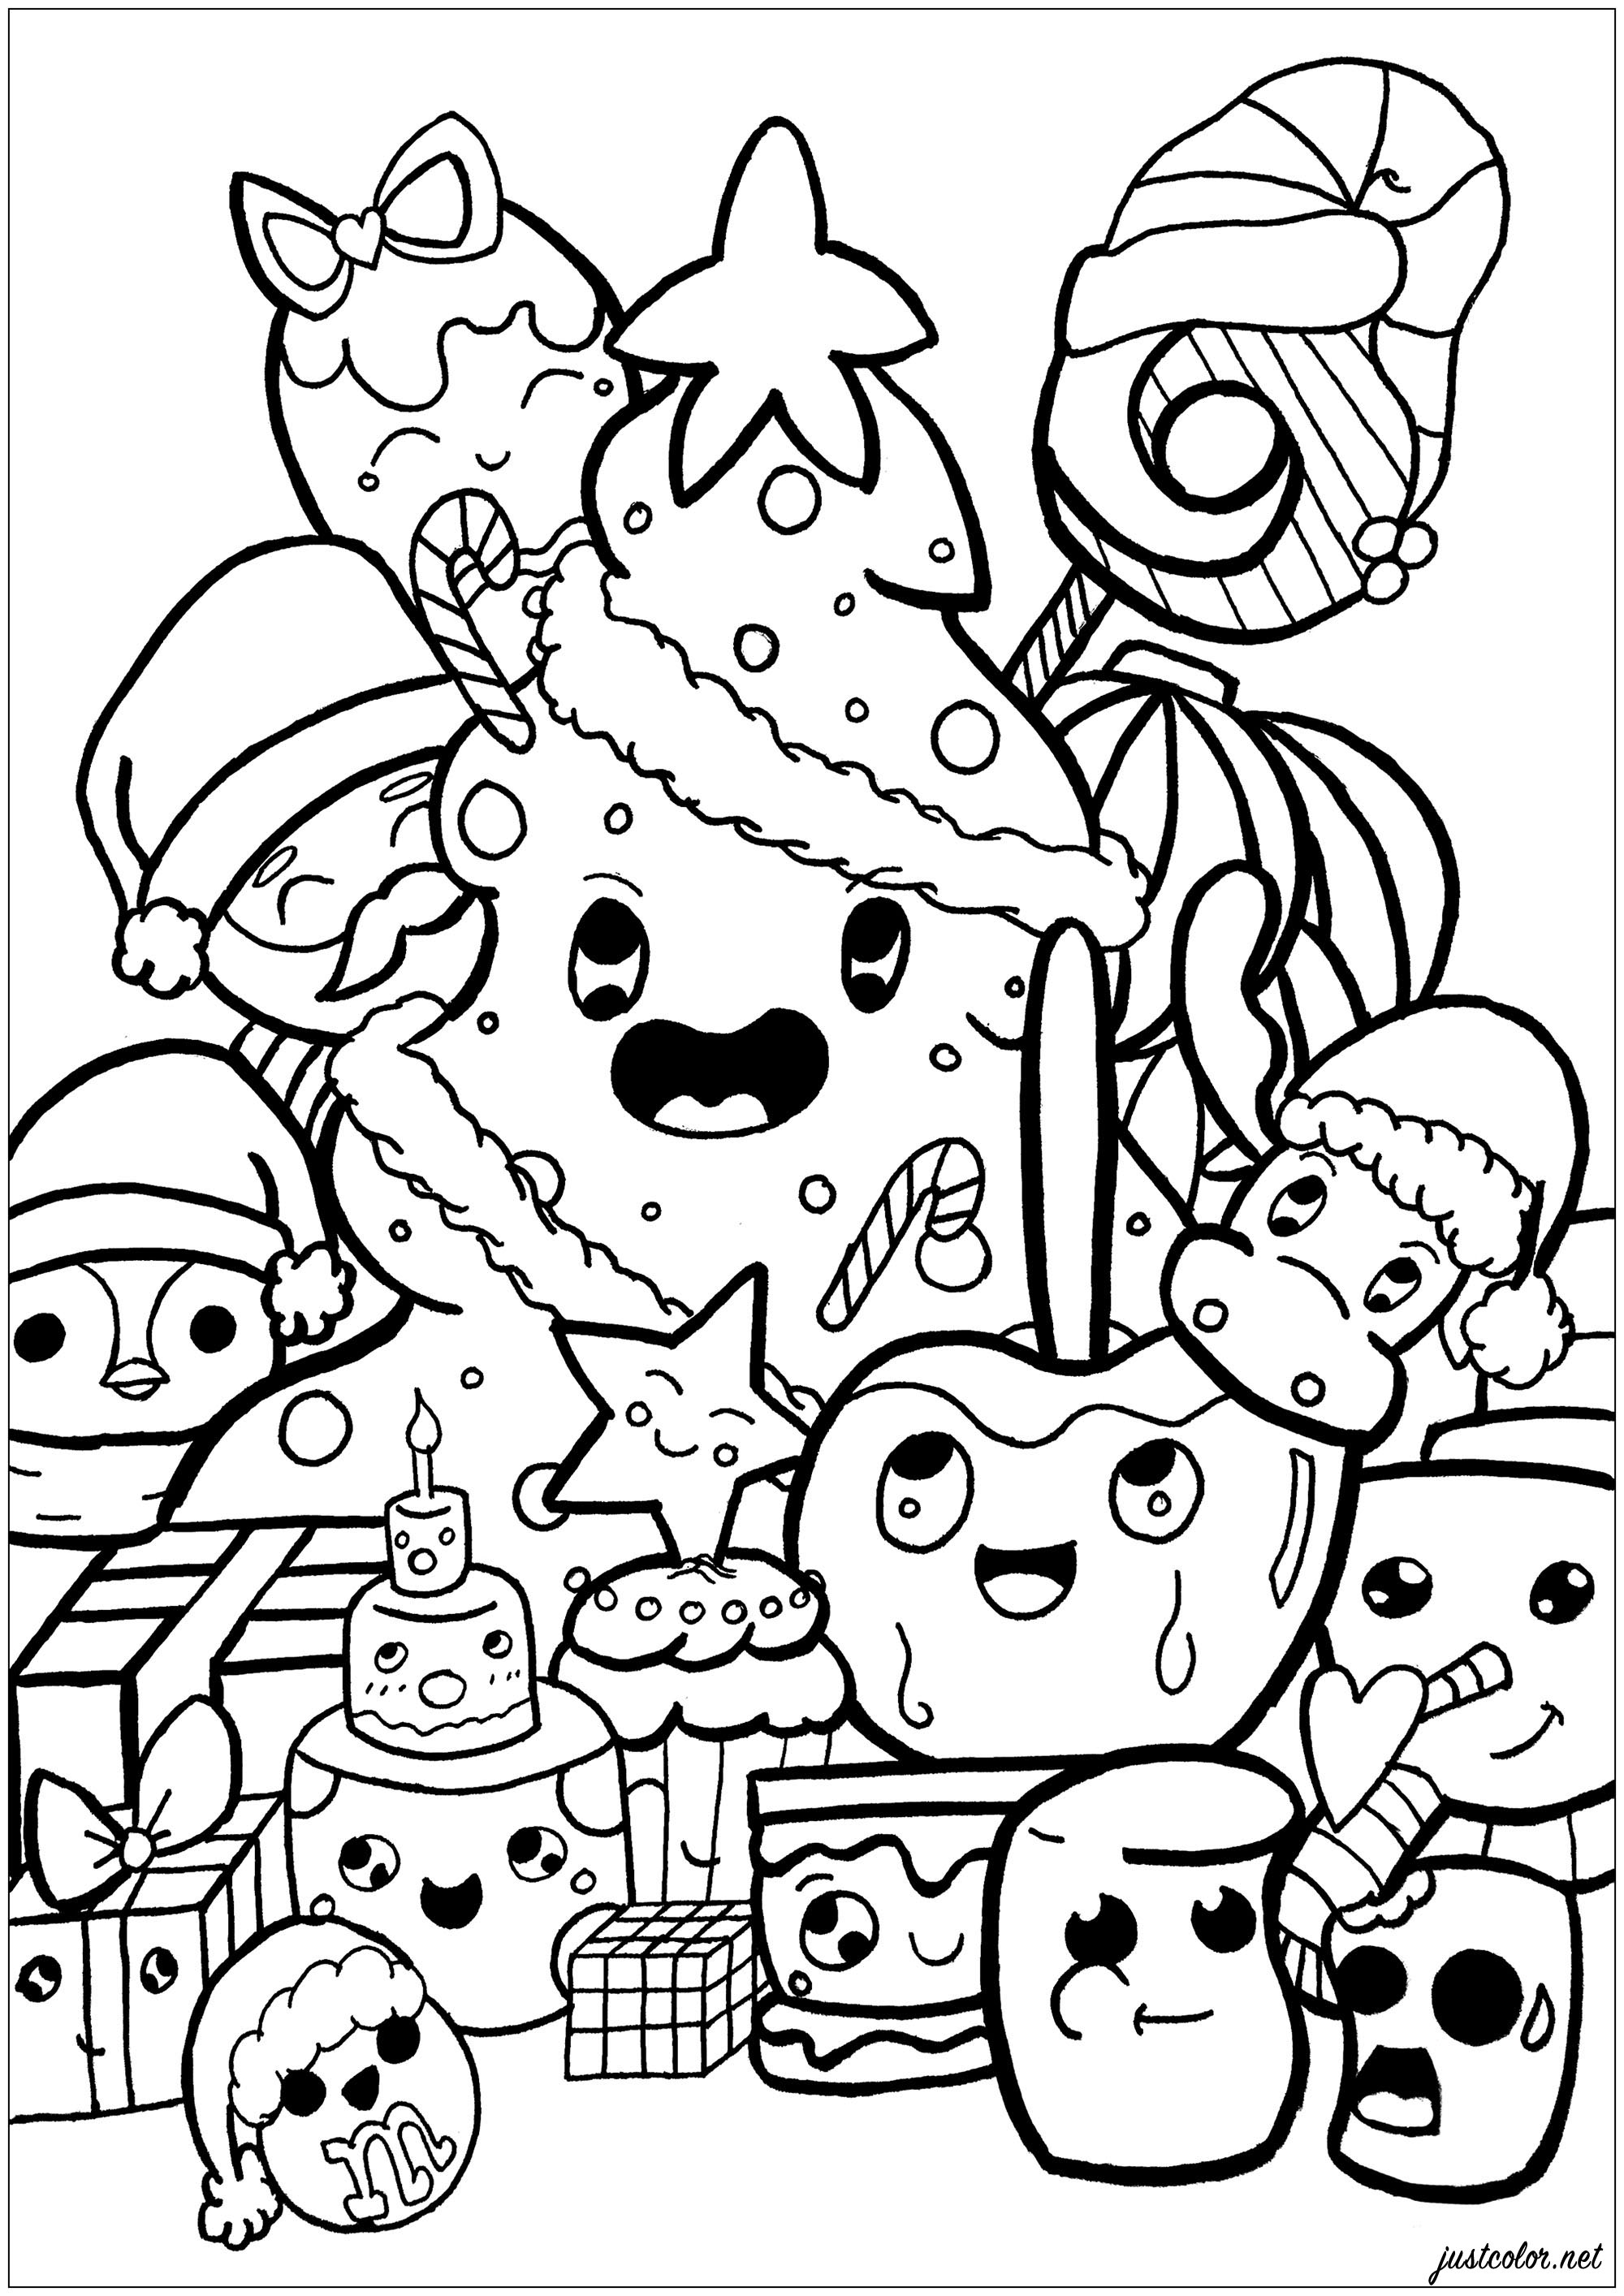 Printable Doodle Art Worksheets